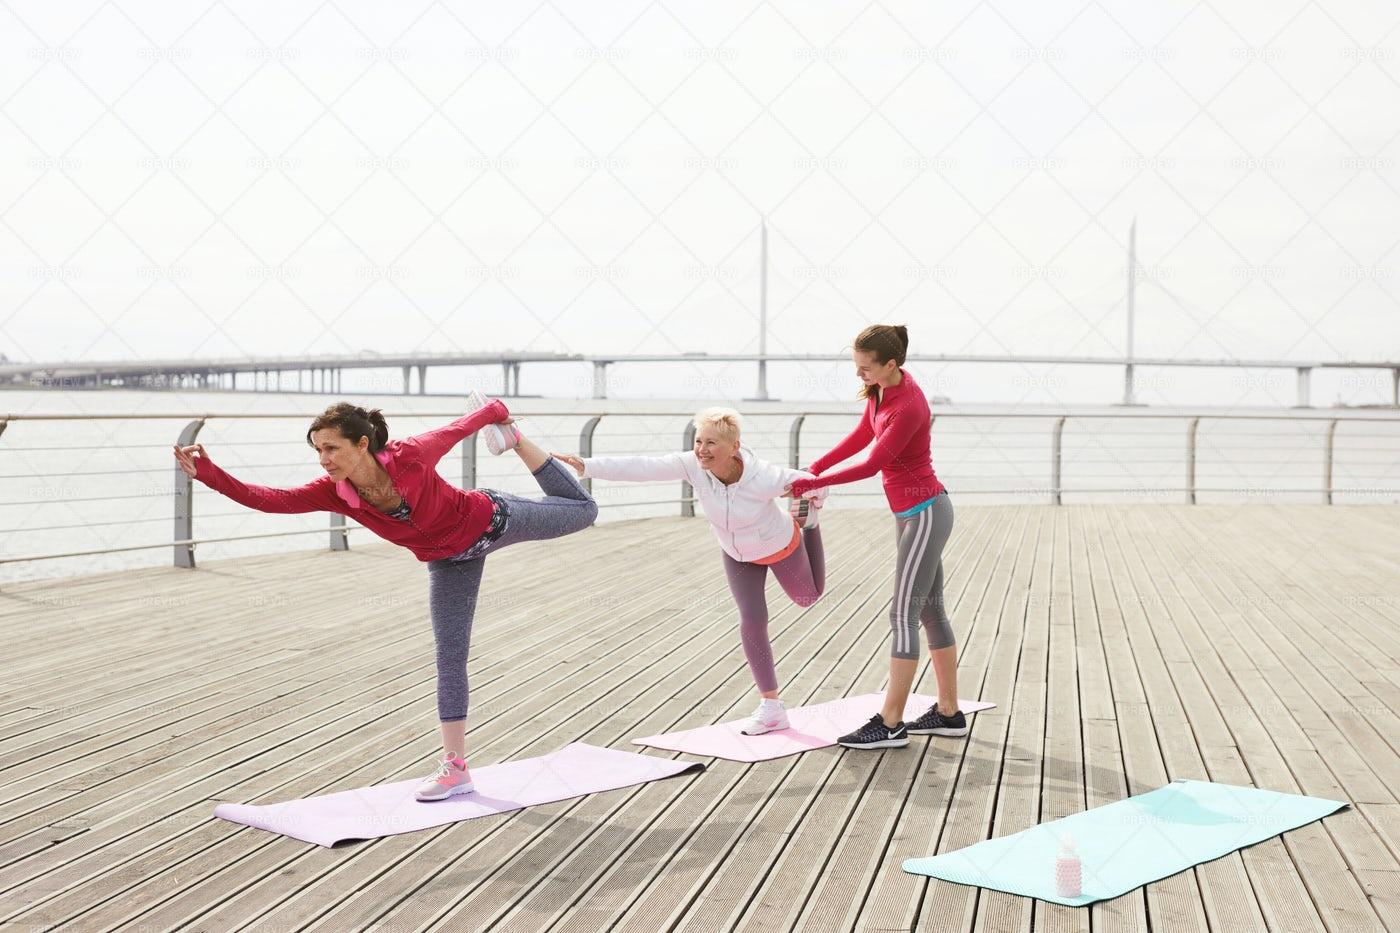 Yoga Class On Pier: Stock Photos